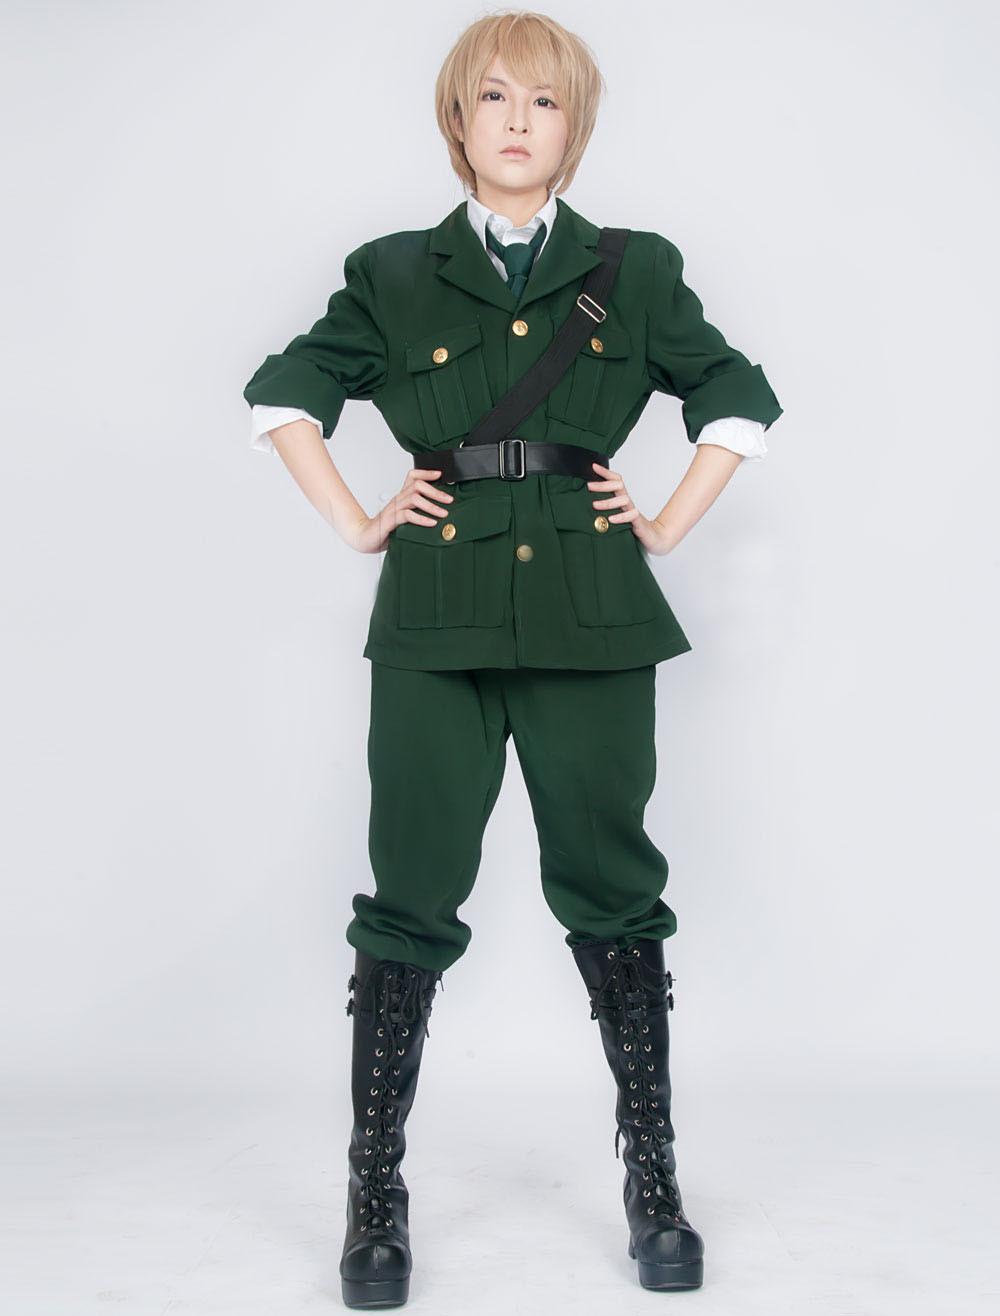 Axis powers ヘタリア イギリス コスプレ衣装